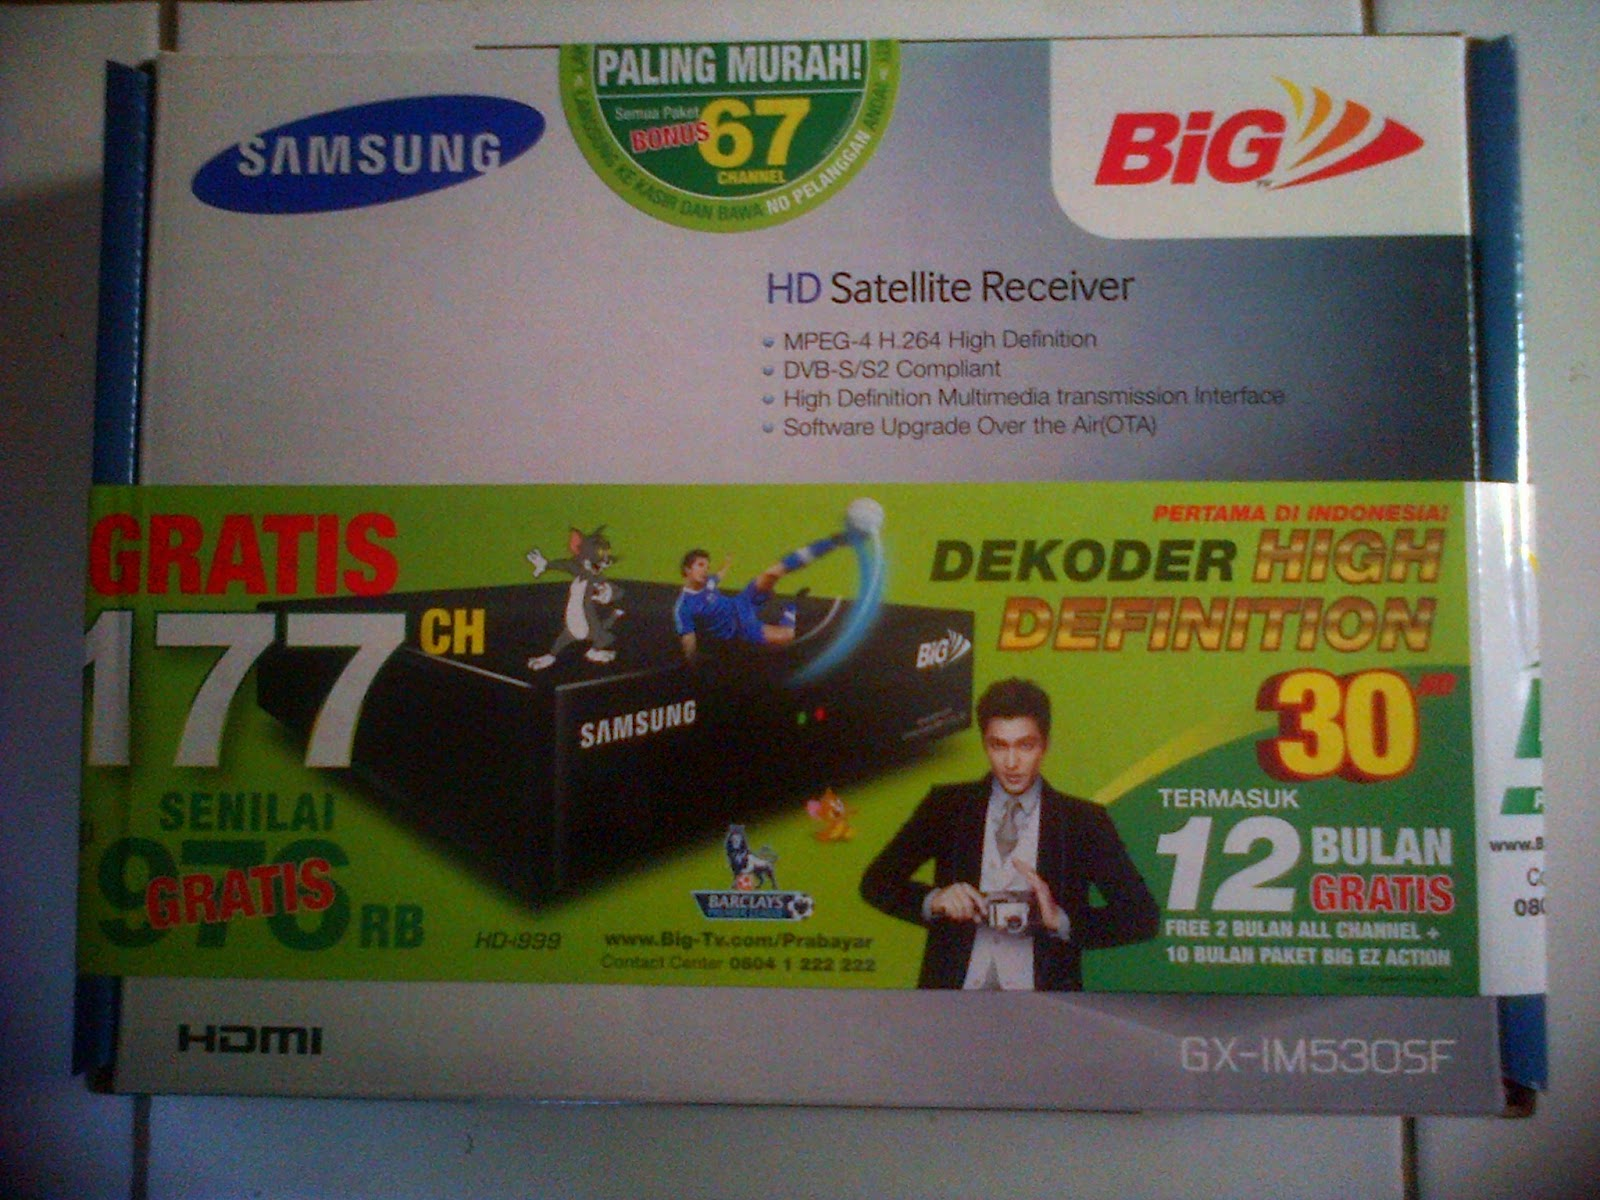 Dekoder / receiver samsung hd big TV